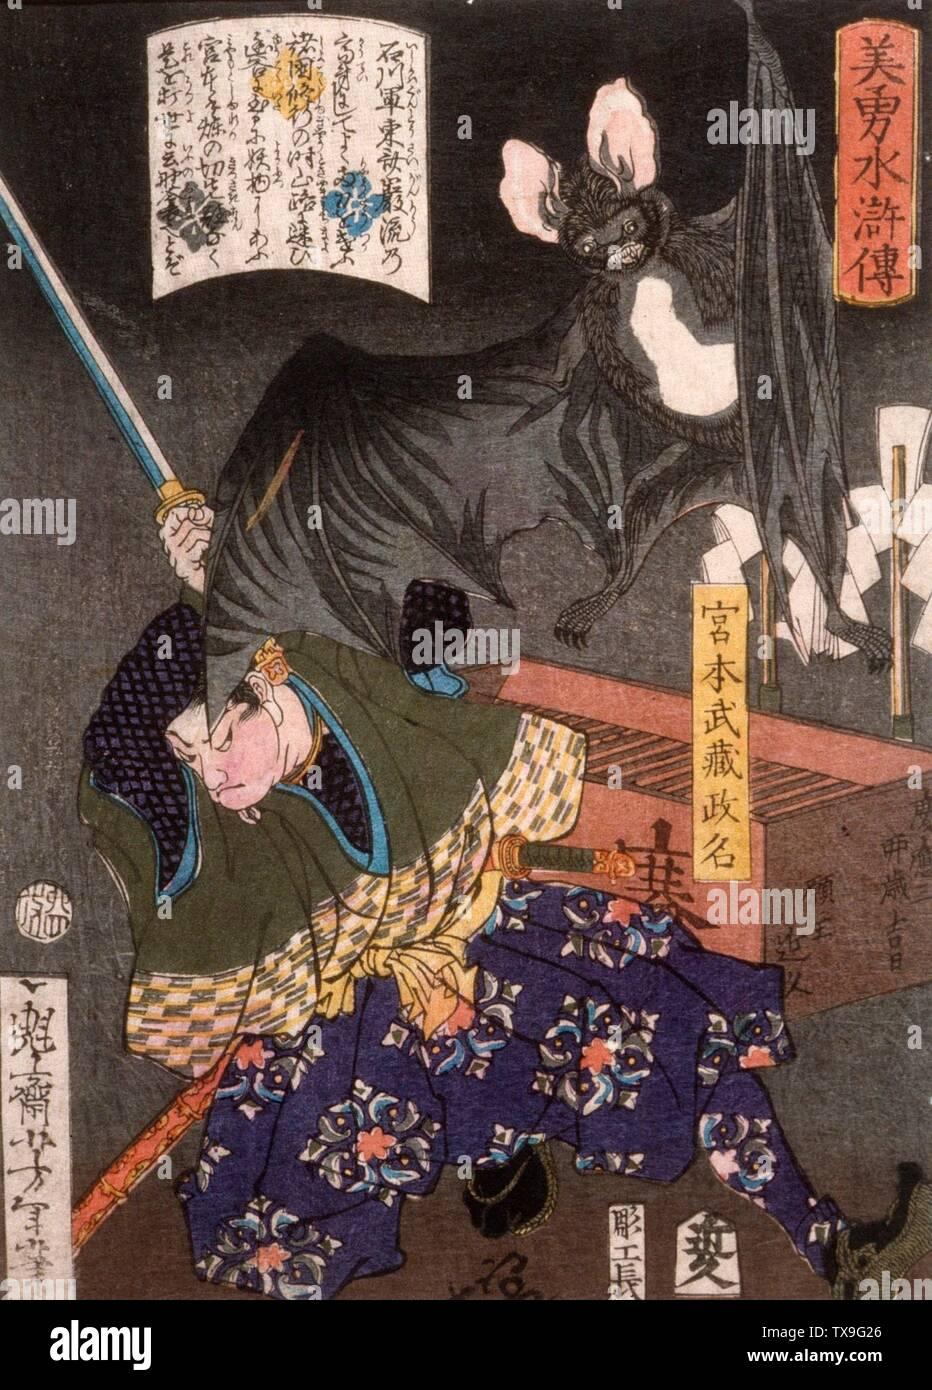 Musashi Miyamoto Stock Photos & Musashi Miyamoto Stock